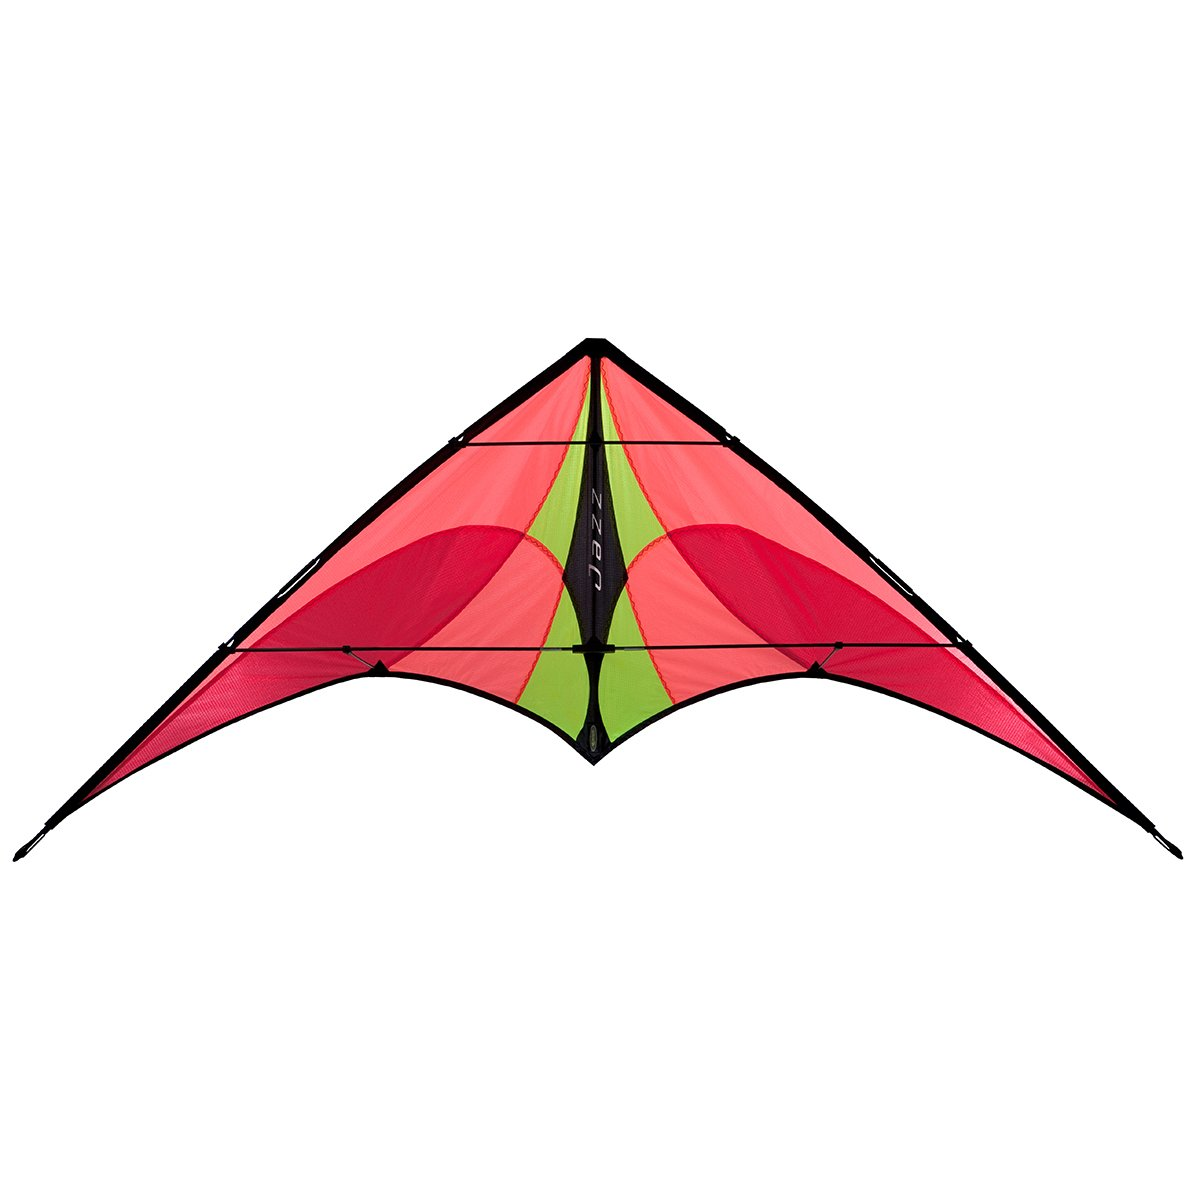 Prism Jazz Dual-line Stunt Kite, Fire by Prism Kite Technology